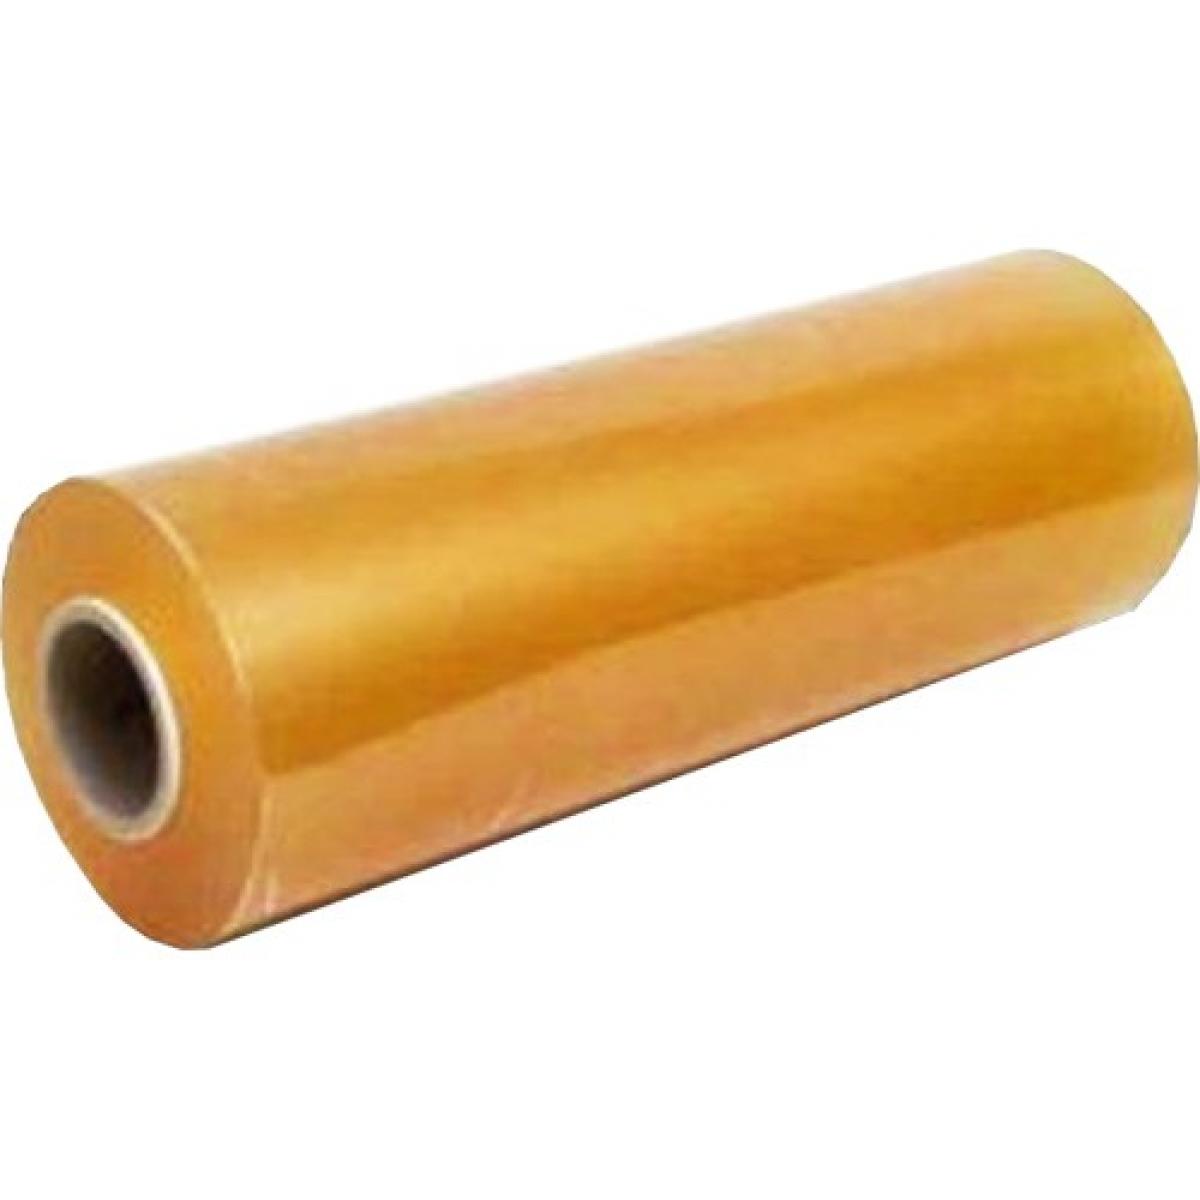 cling film 100sqft (30cm)